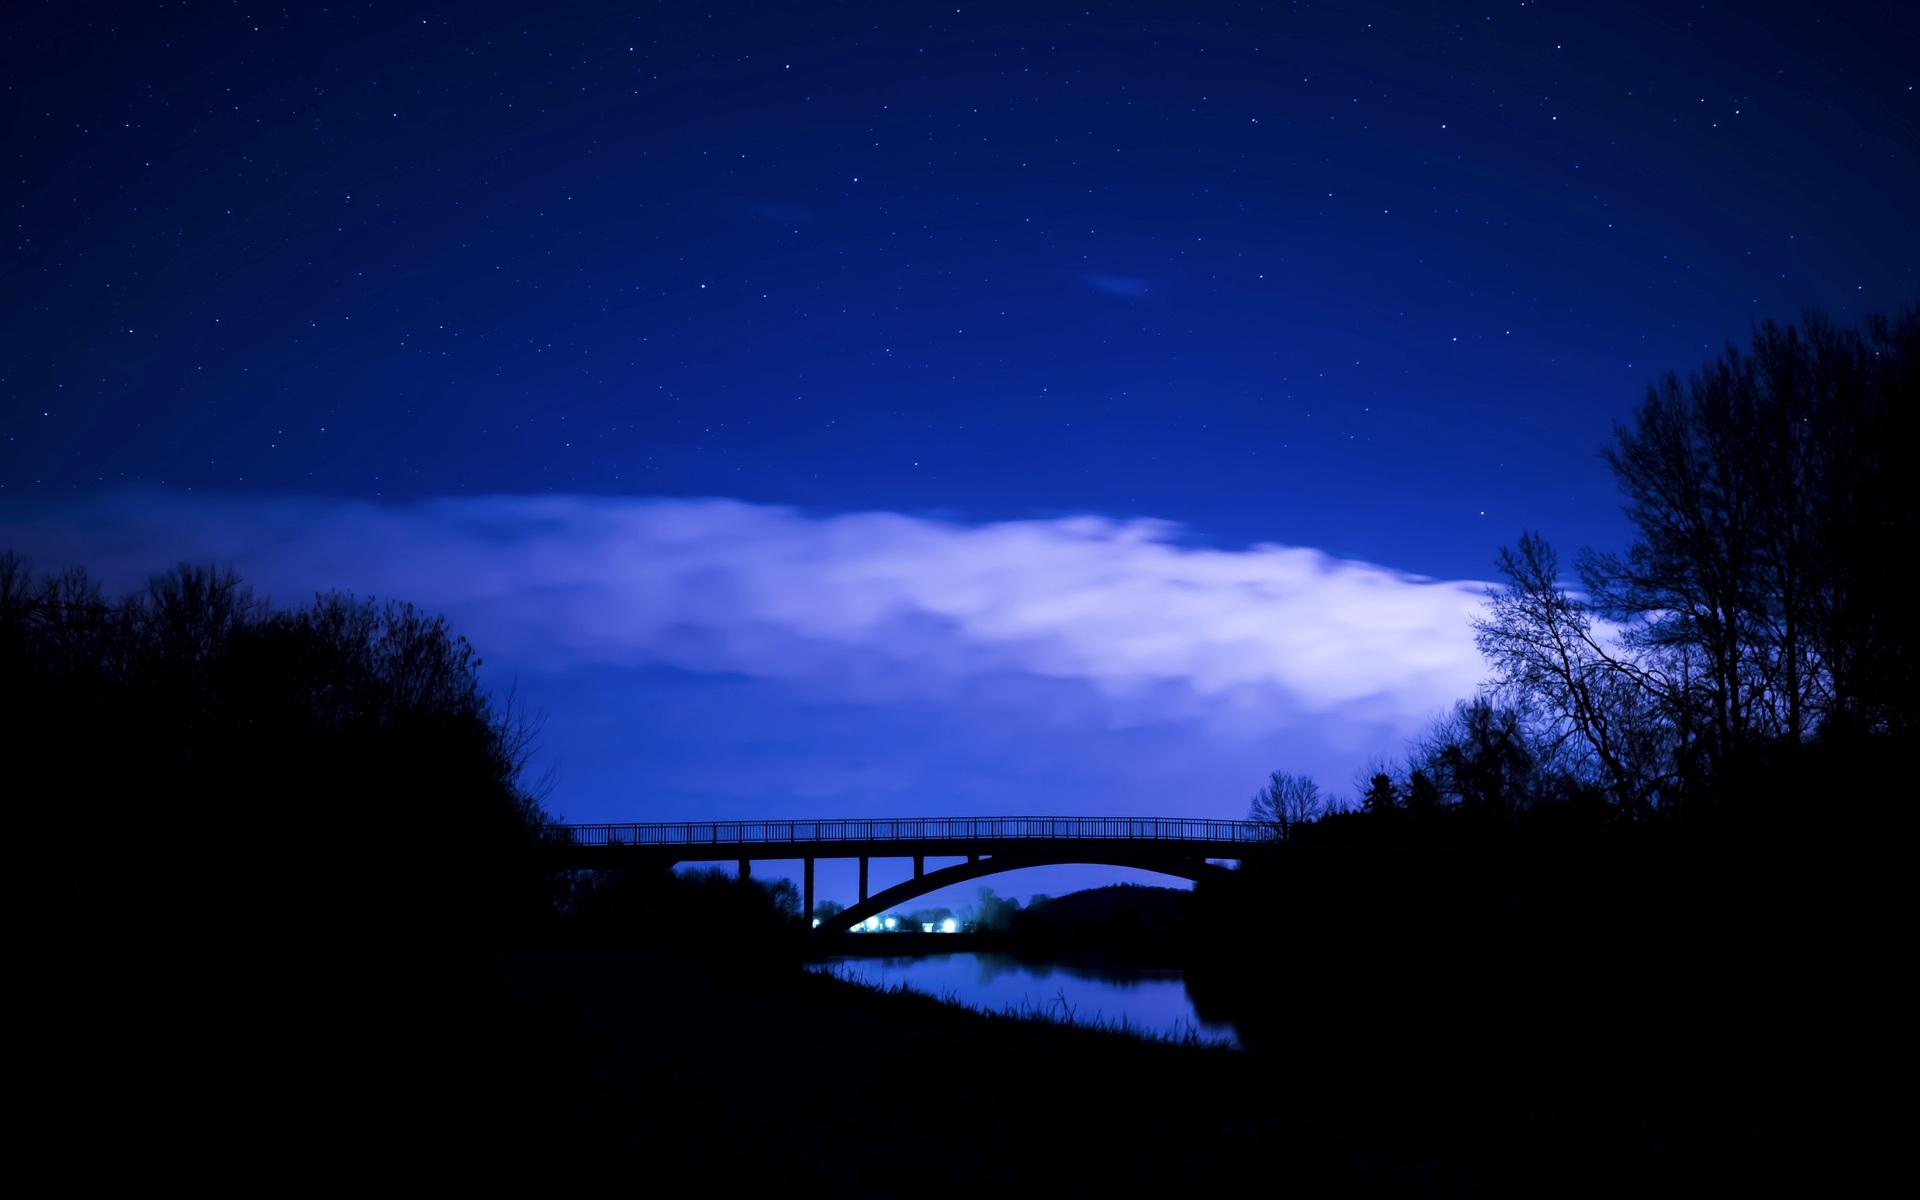 1920x1200 Bridge Night Clouds Starry Sky 5k 1080P Resolution HD 4k